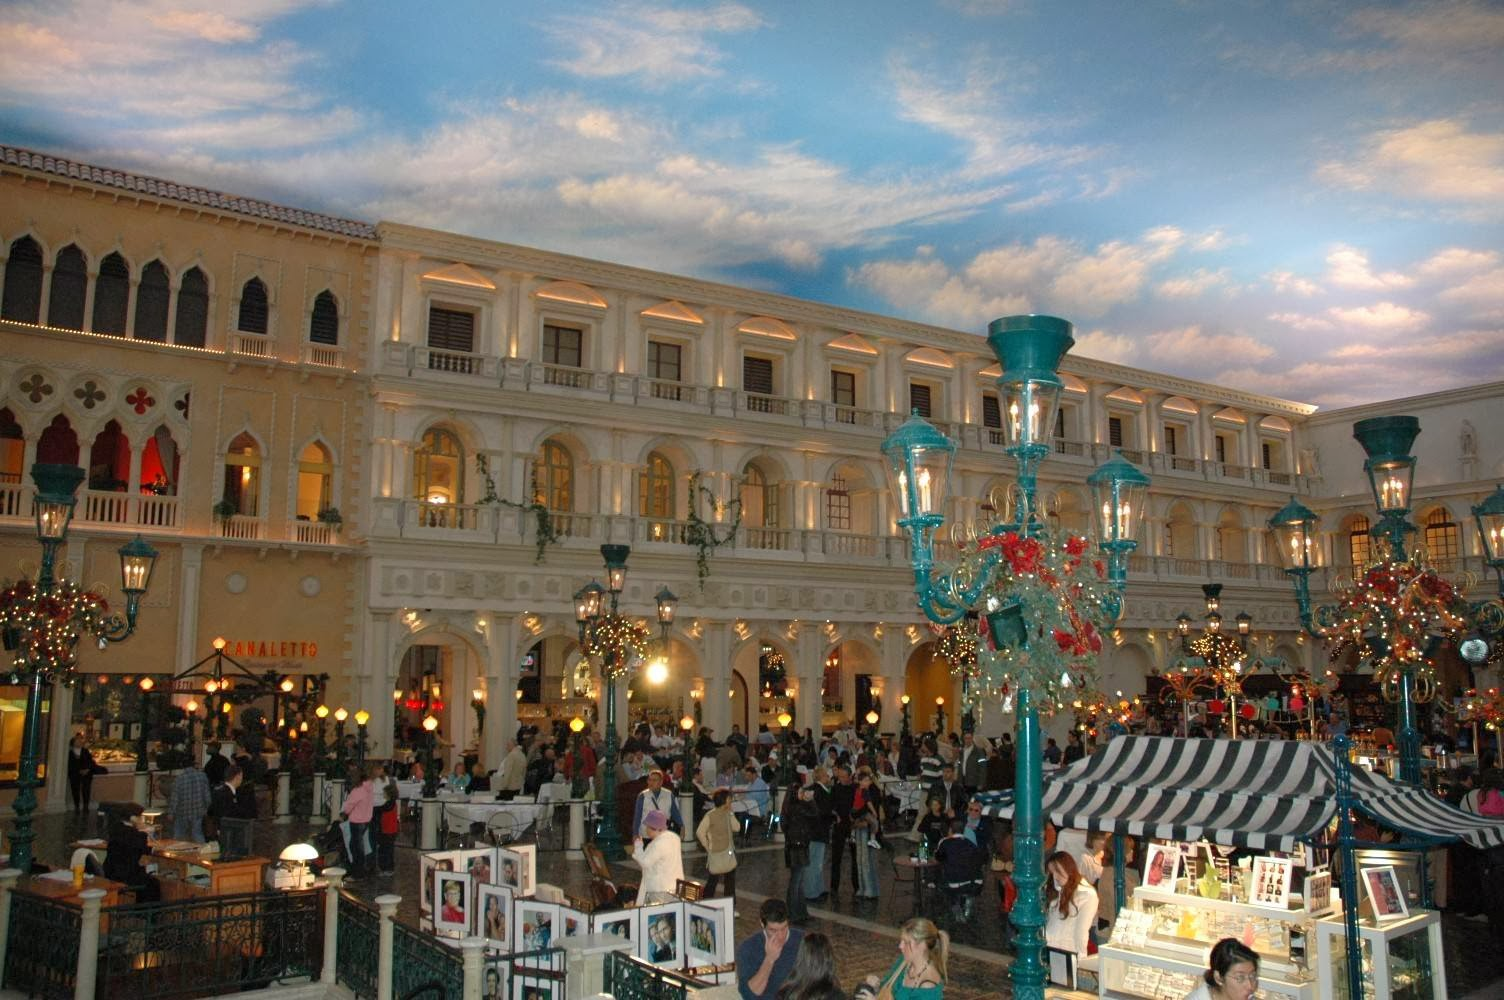 The Grand Canal Shoppes At Venetian em Las Vegas